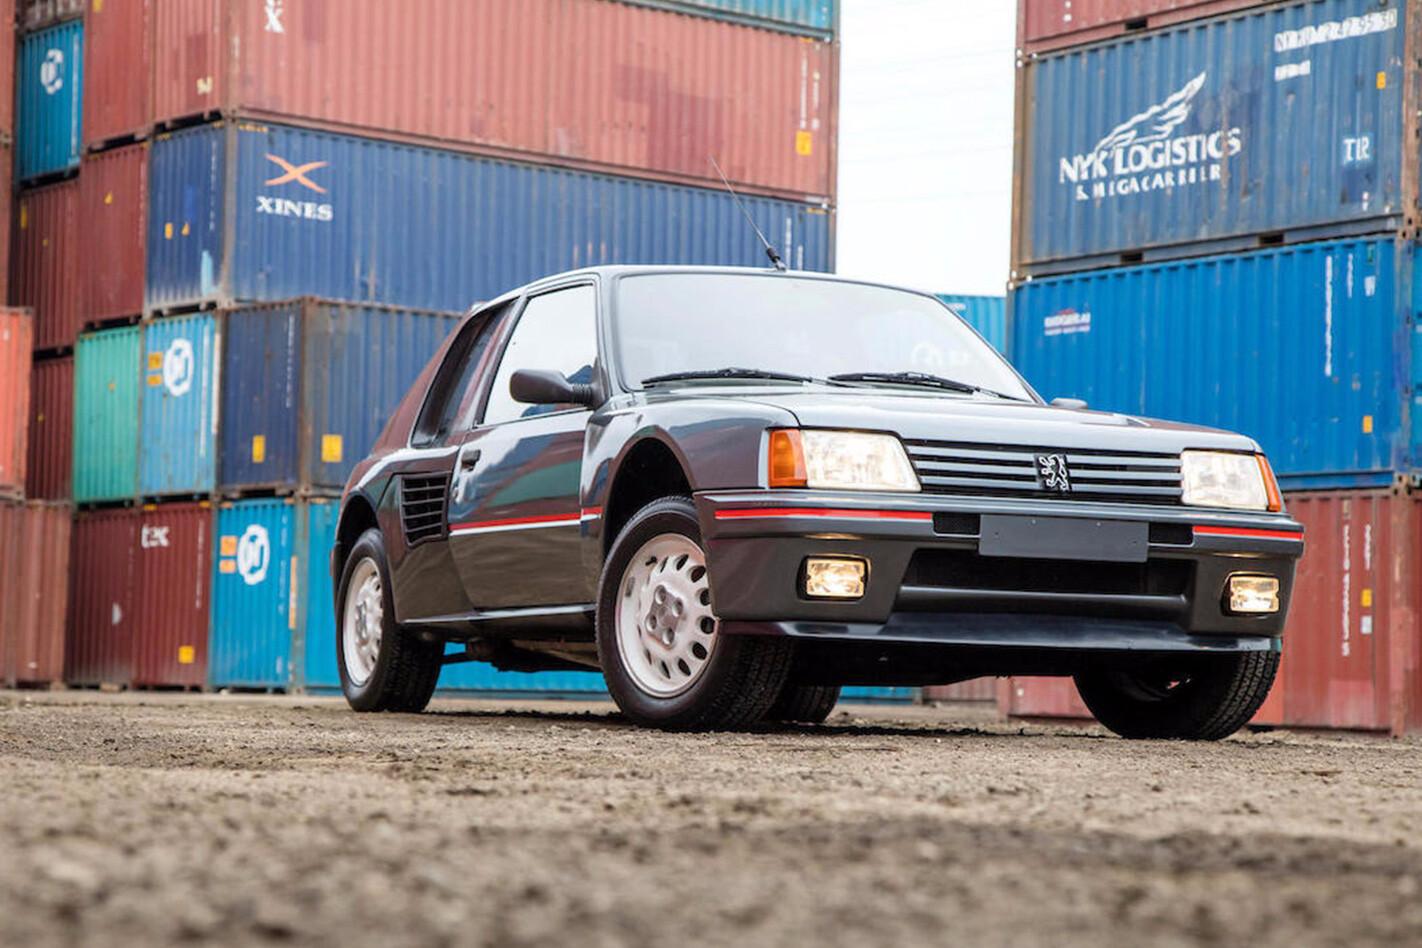 1985-Peugeot-205-Turbo-16.jpg